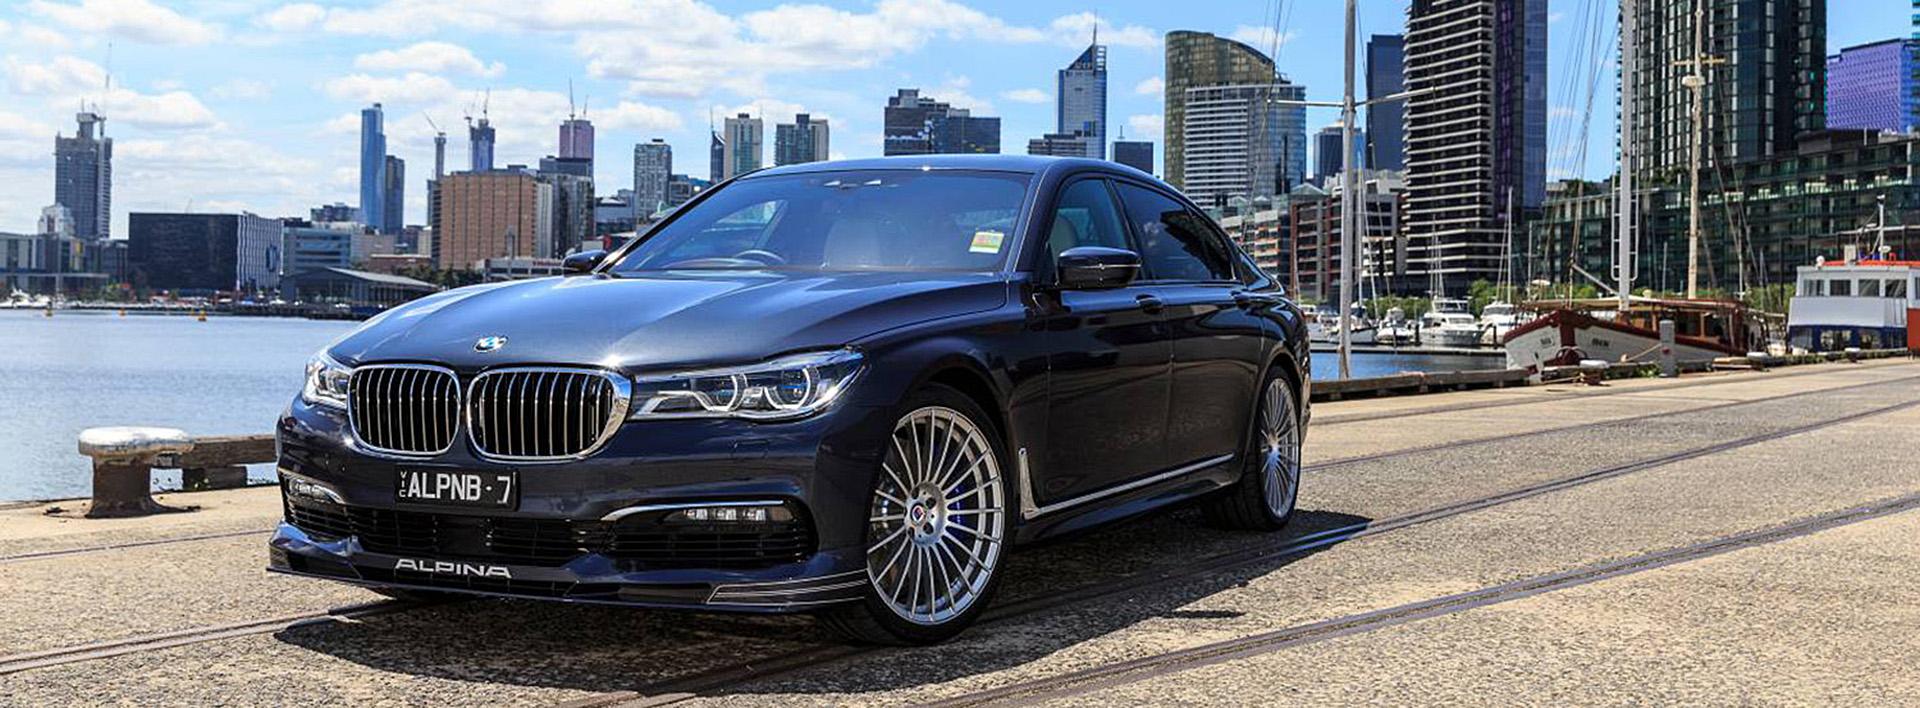 ALPINA Automobiles Australia